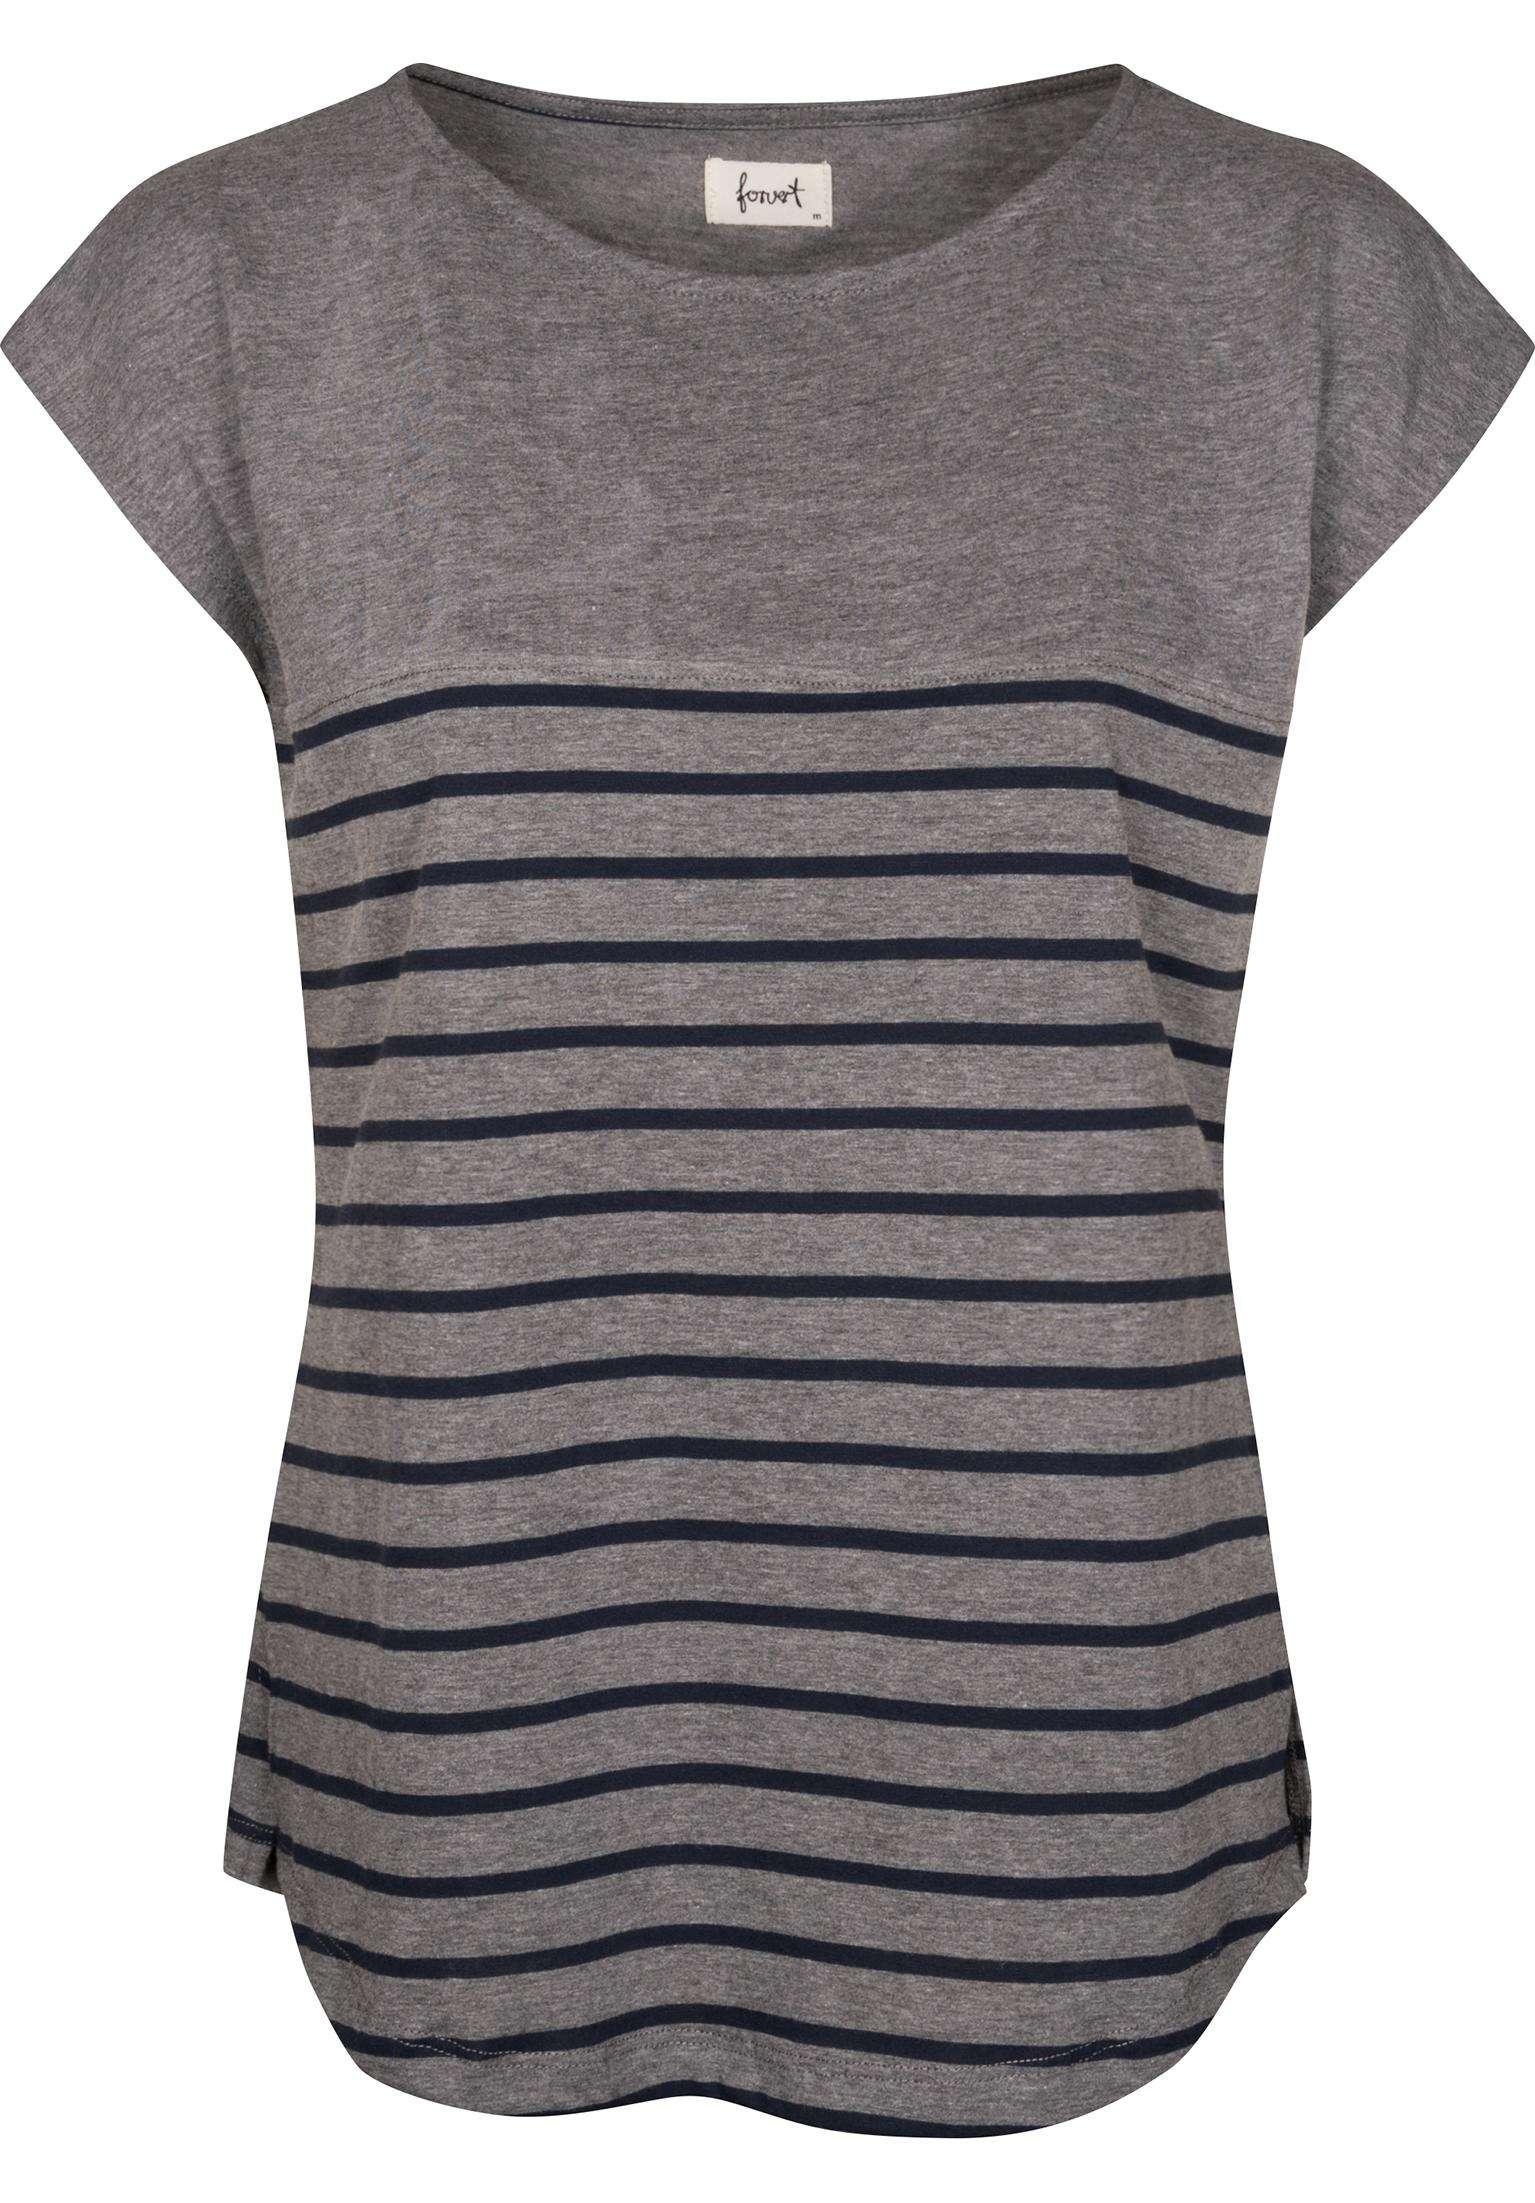 Newport Forvert Camisetas In Greymelange Navy Für Mujer Titus